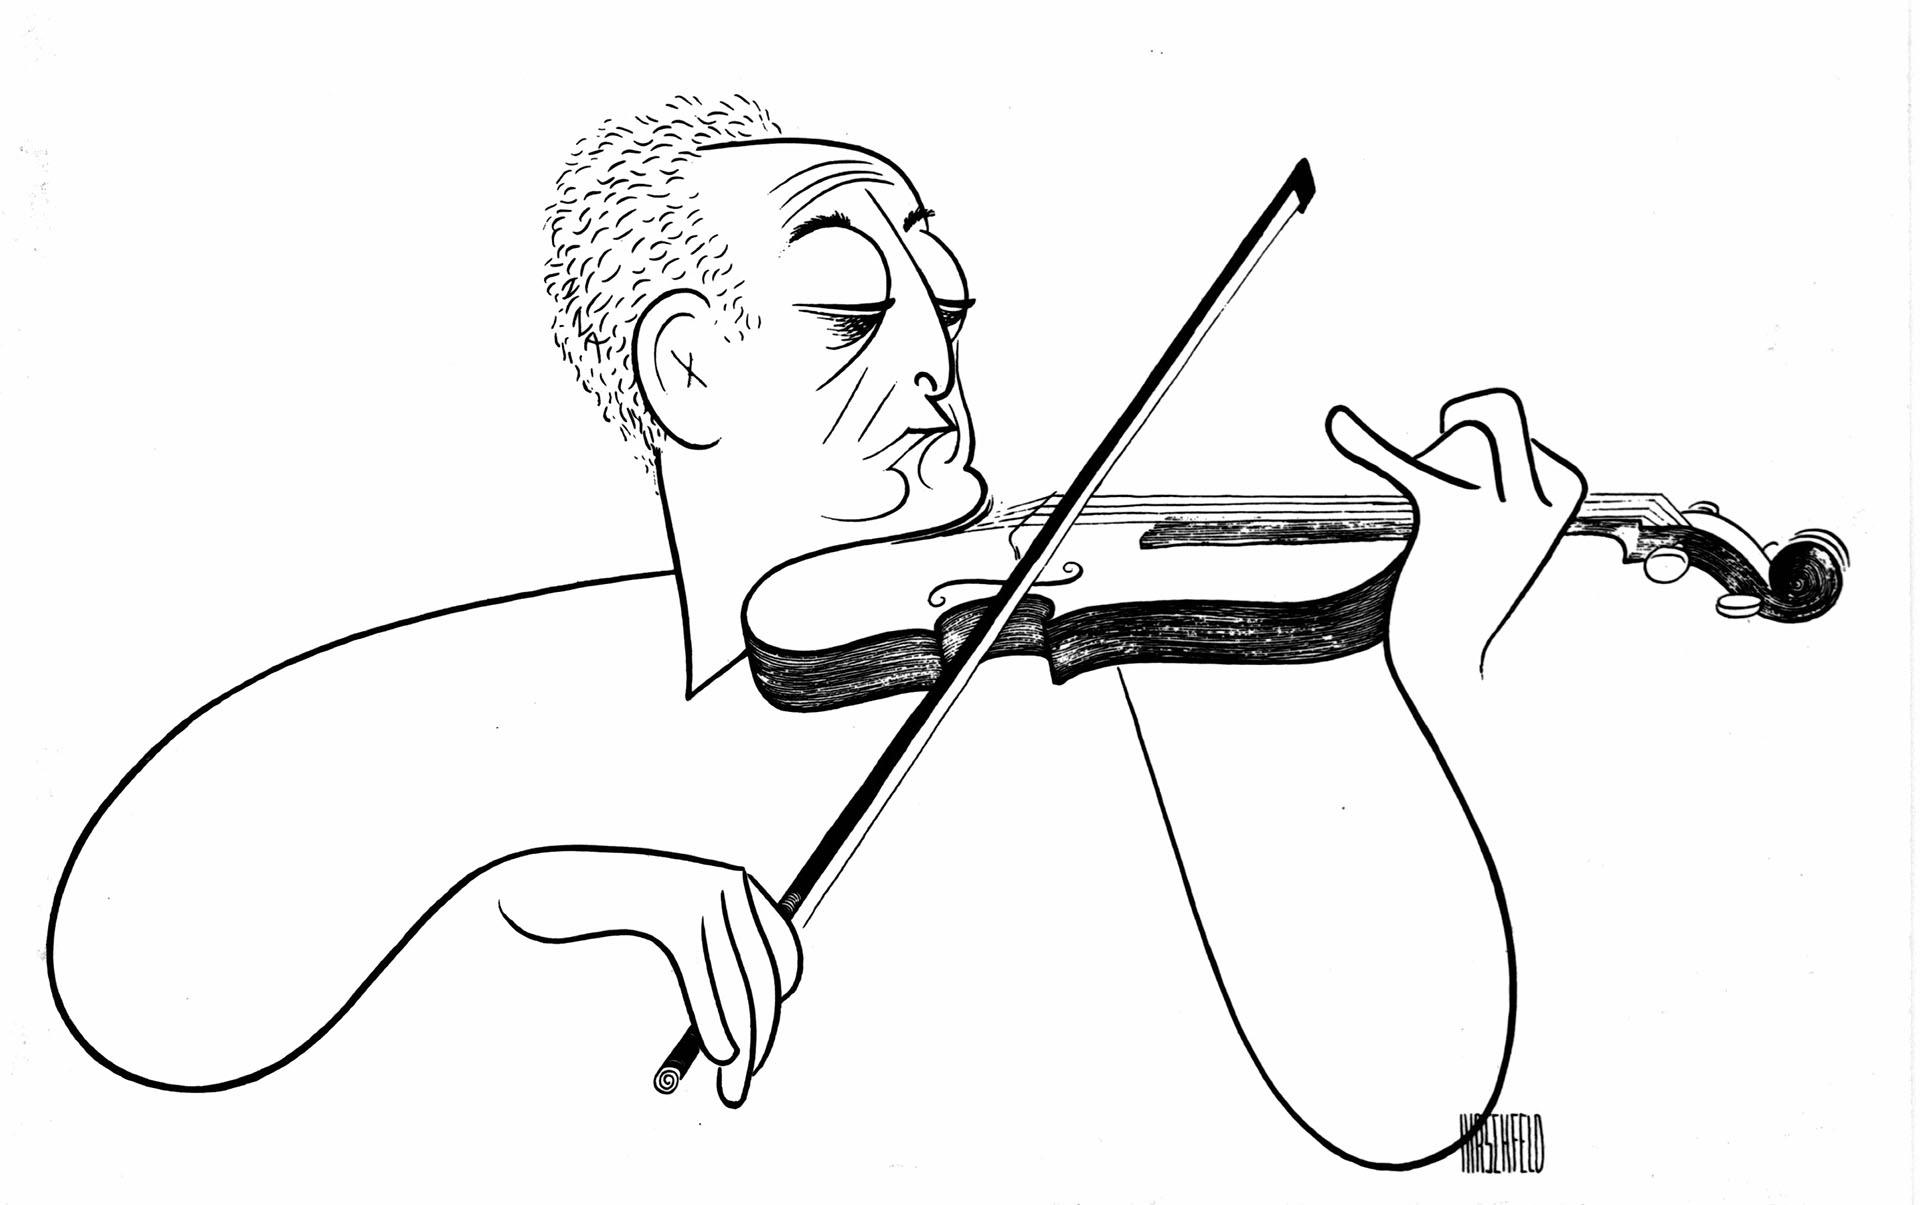 Drawn violinist  Pencil and in color drawn violinist